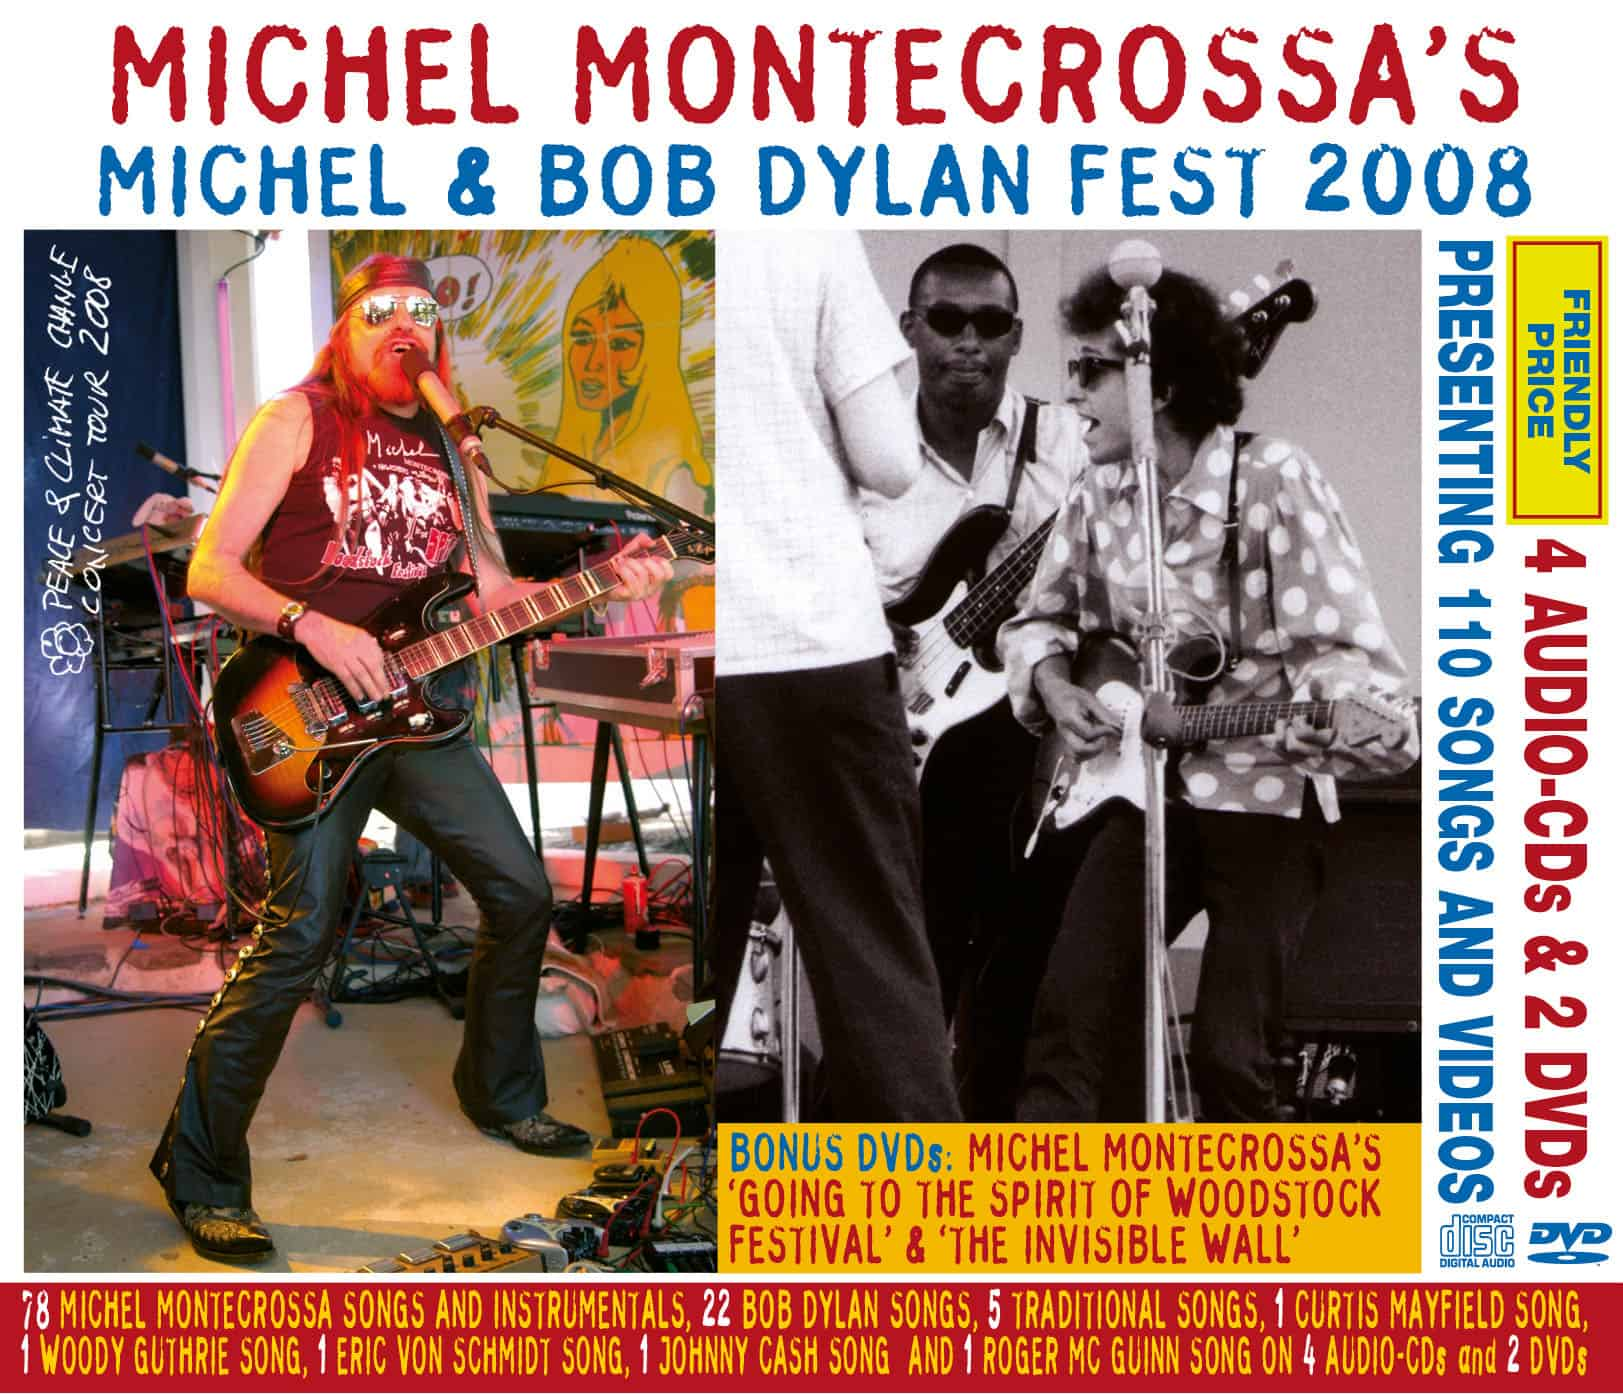 Michel Montecrossa's Michel & Bob Dylan Fest 2008